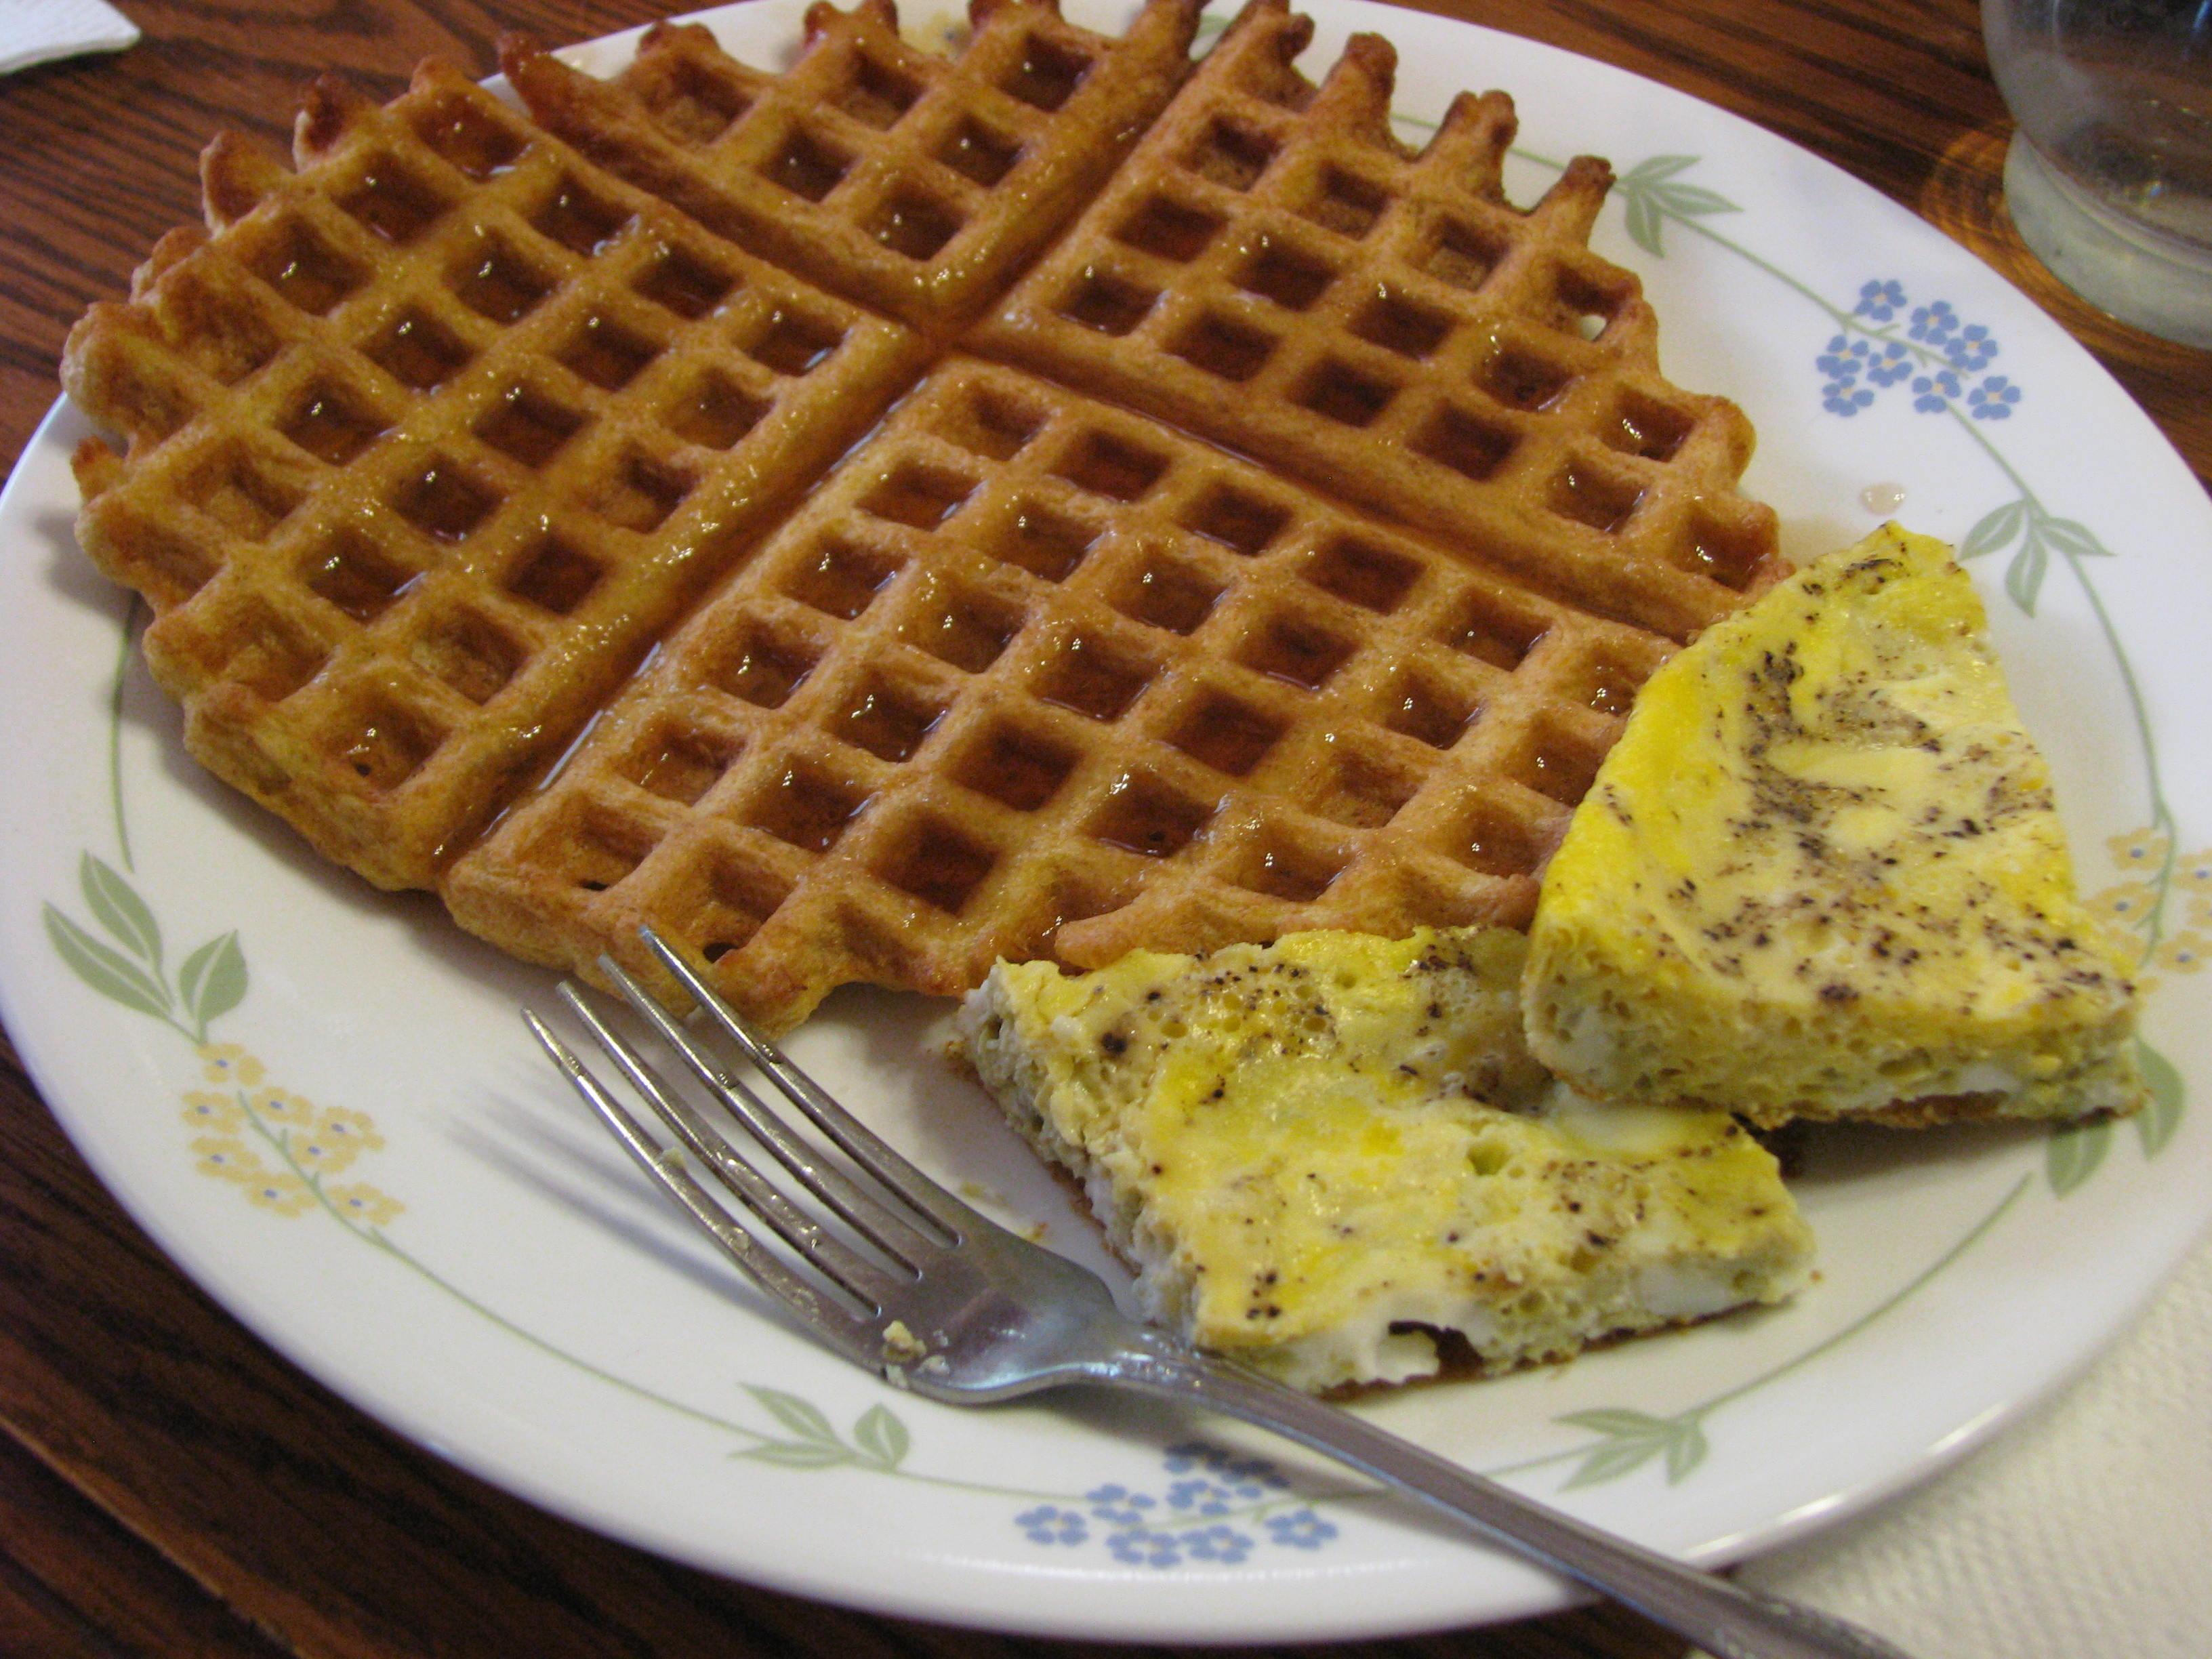 Trim Healthy Mama Bread  Trim Healthy Mama Waffles or Pancakes S Sheri